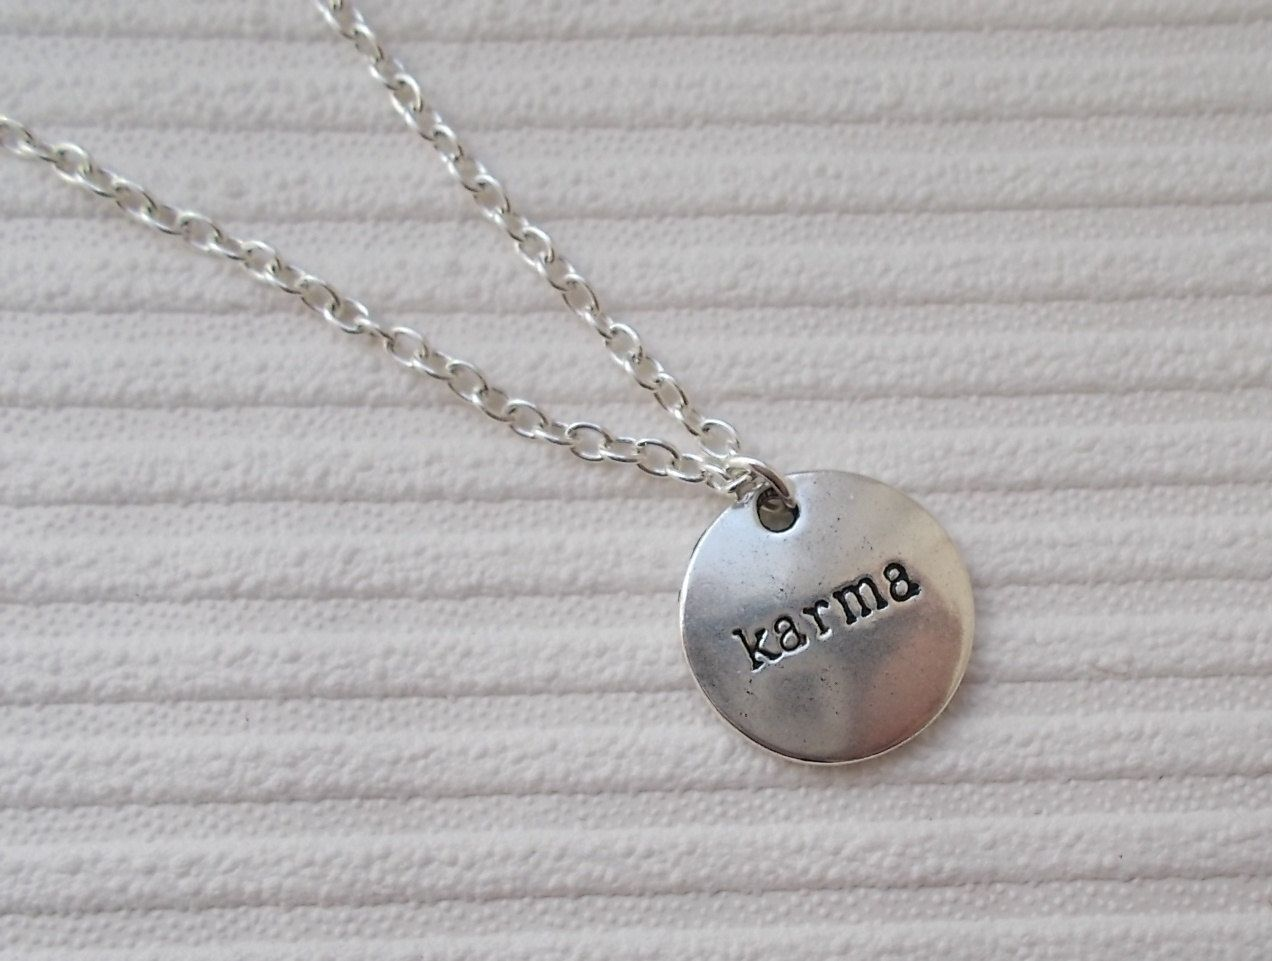 silver karma necklace handmade necklace silver by nikajewellerybox, £4.99